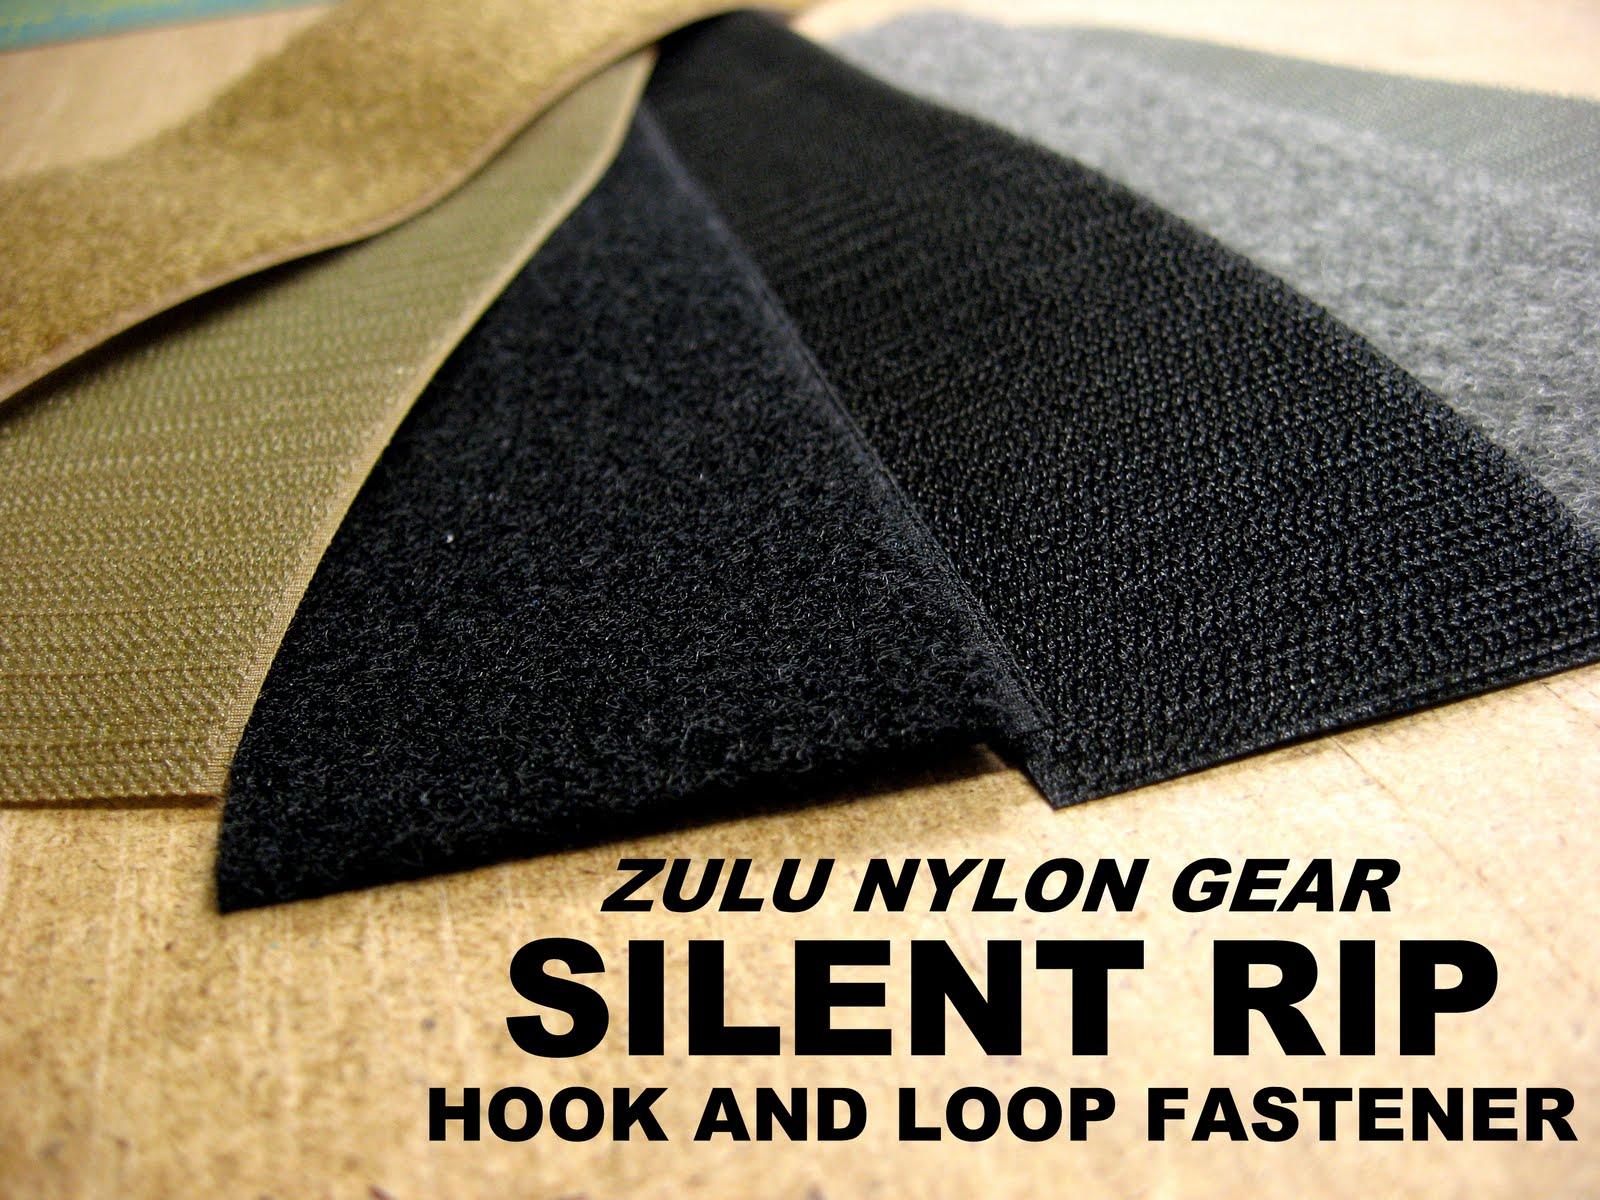 Zulu Nylon Gear Silent Rip